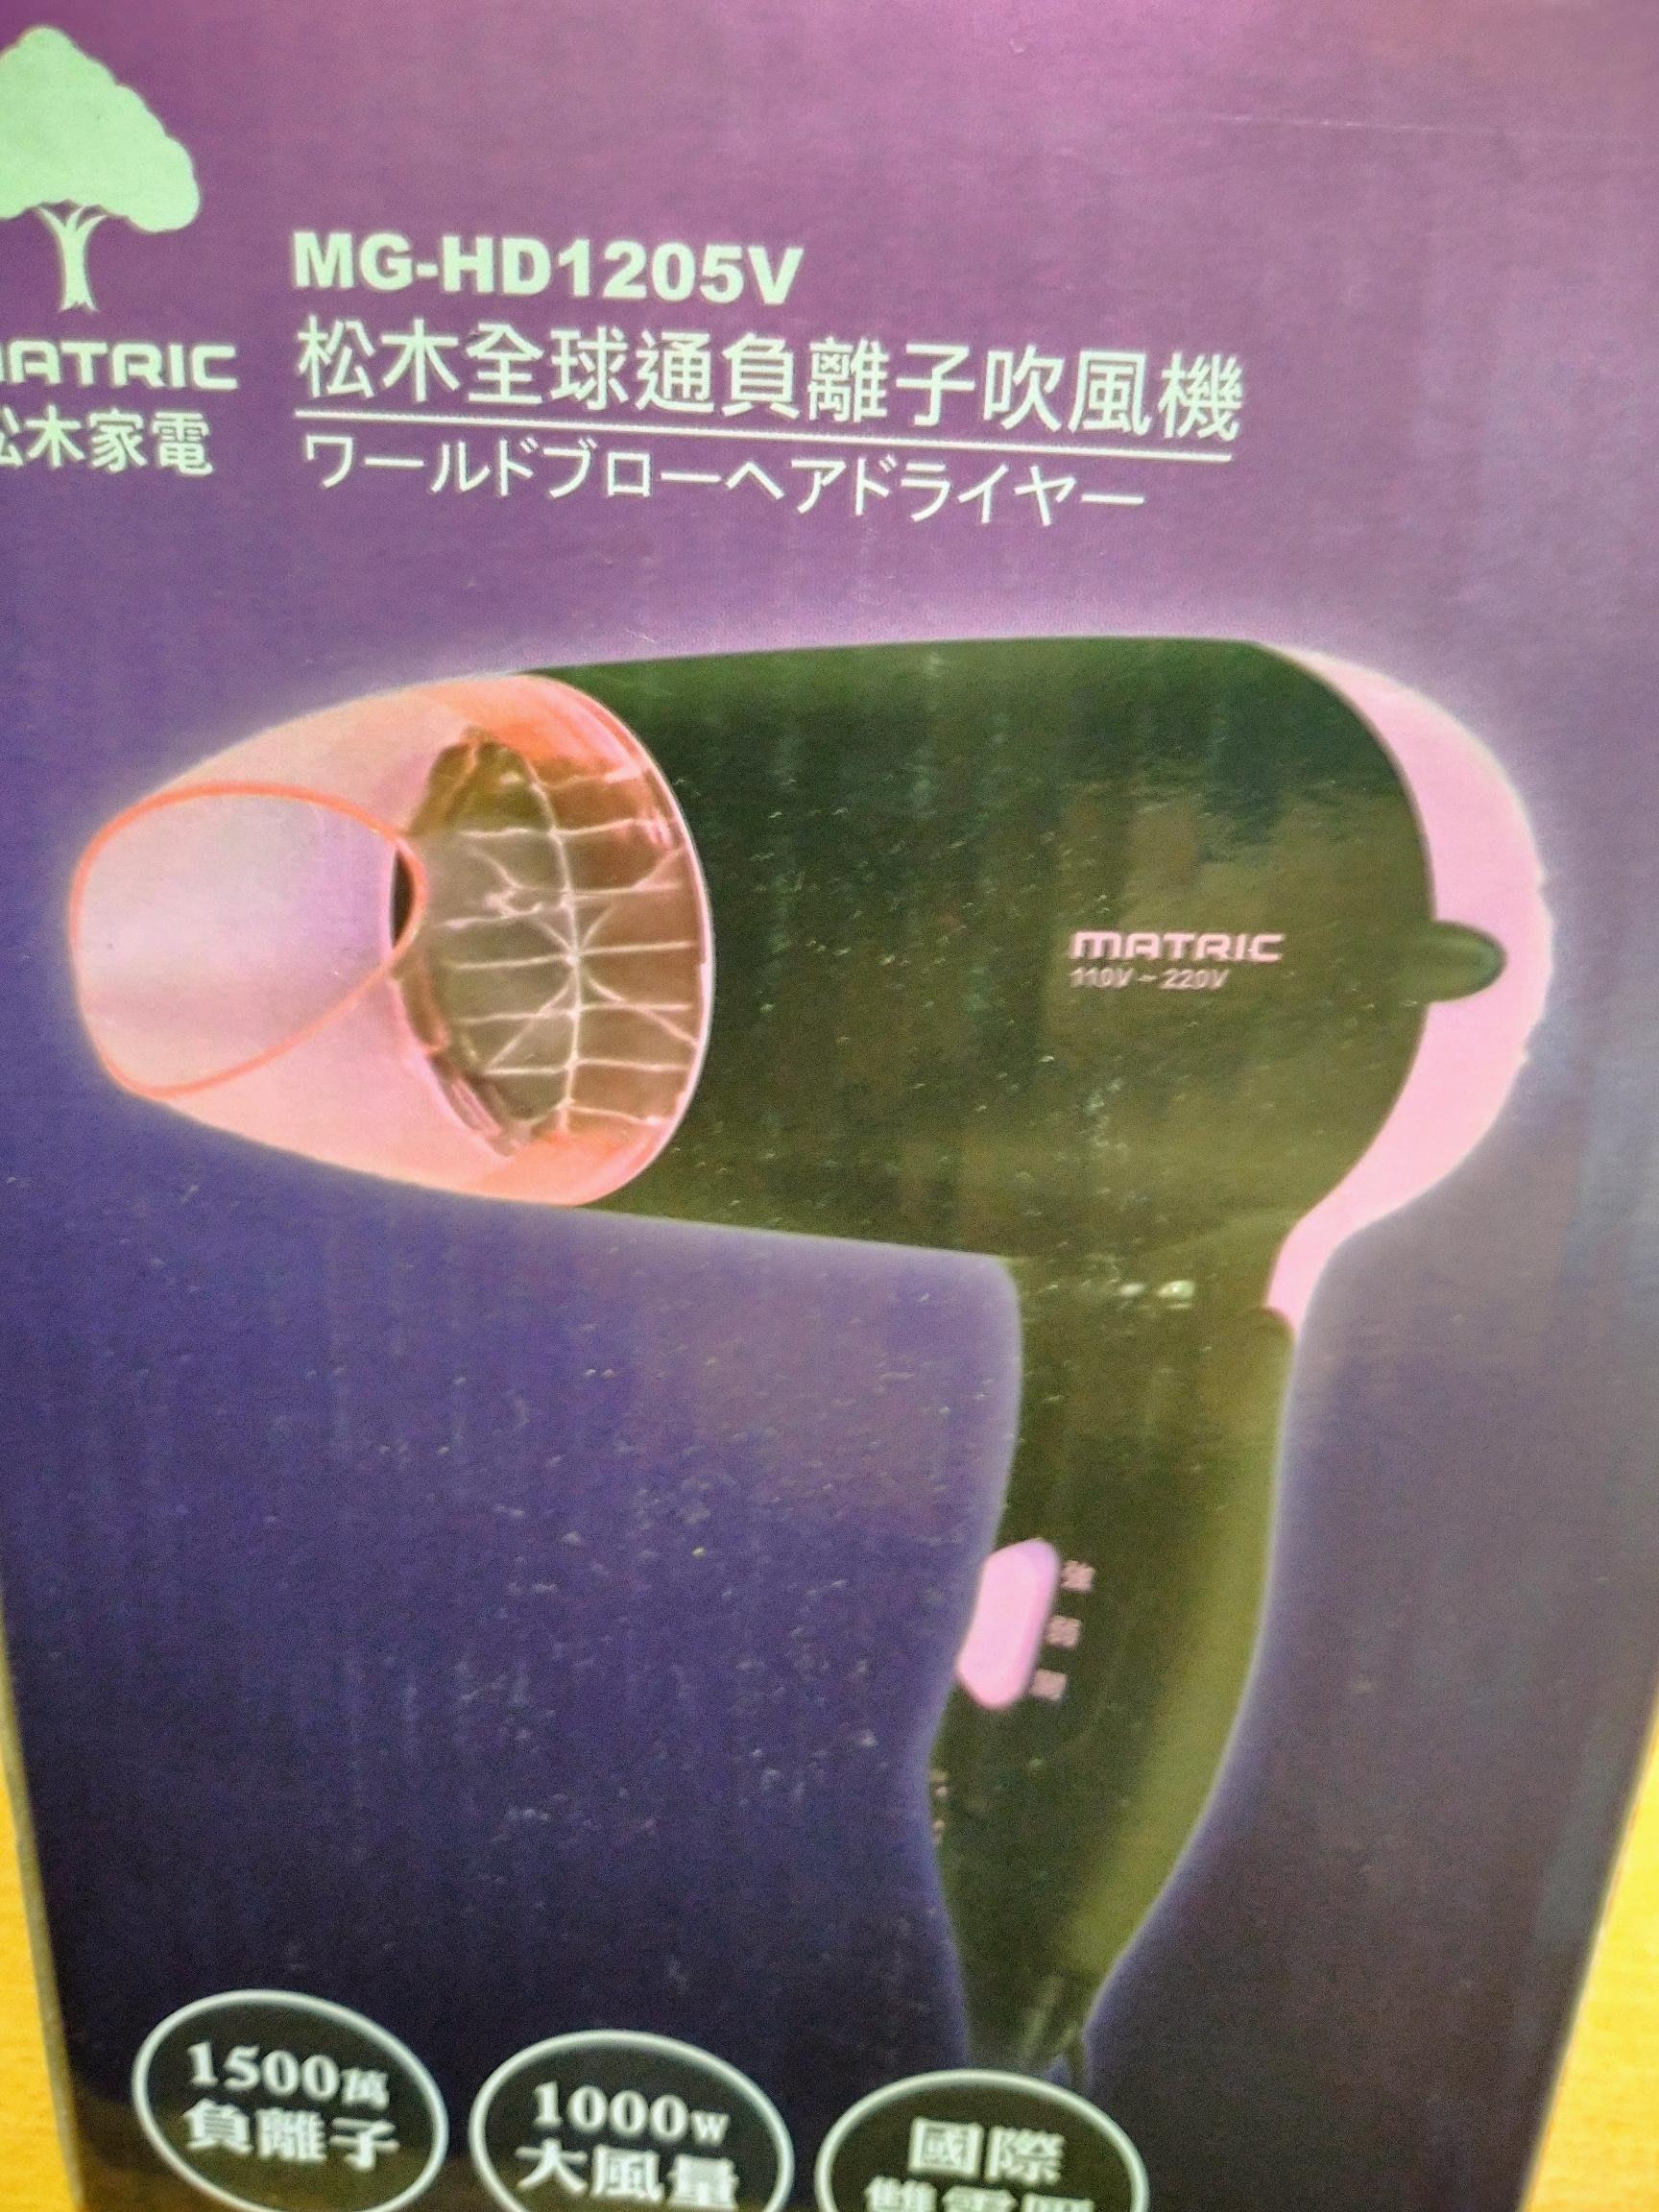 松木MATRIC負離子吹風機mg-hd1205v便宜賣